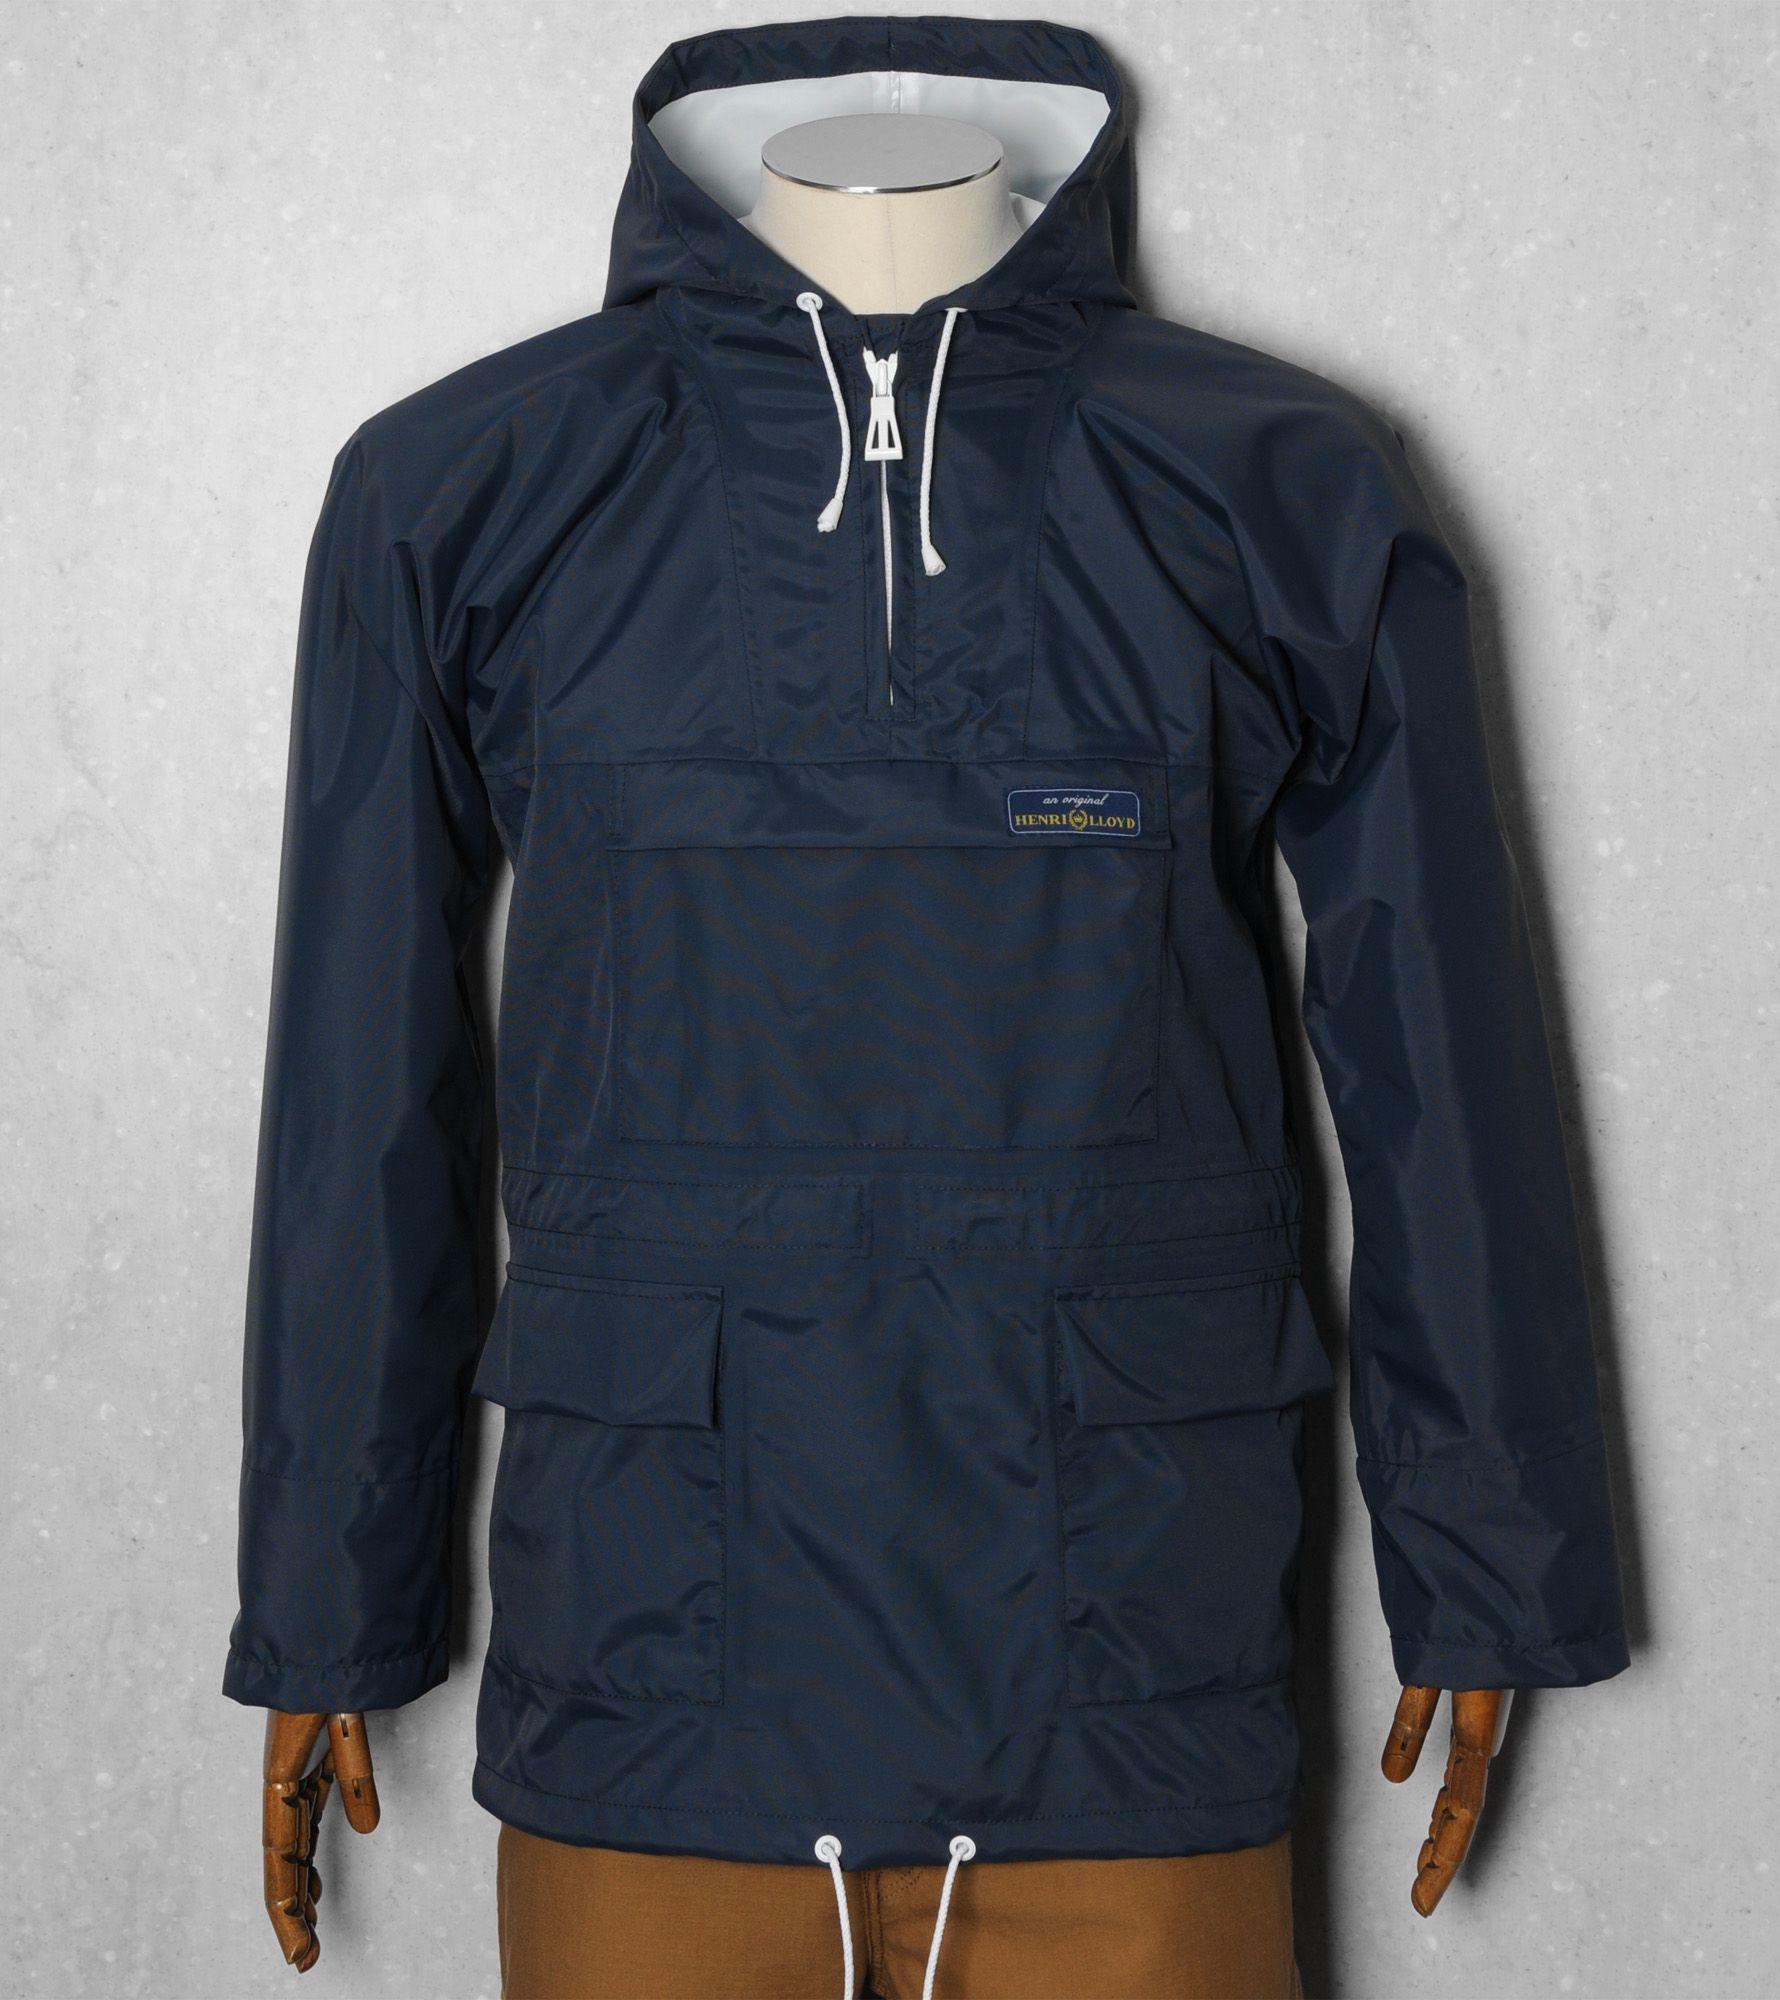 Henri lloyd viking jacket